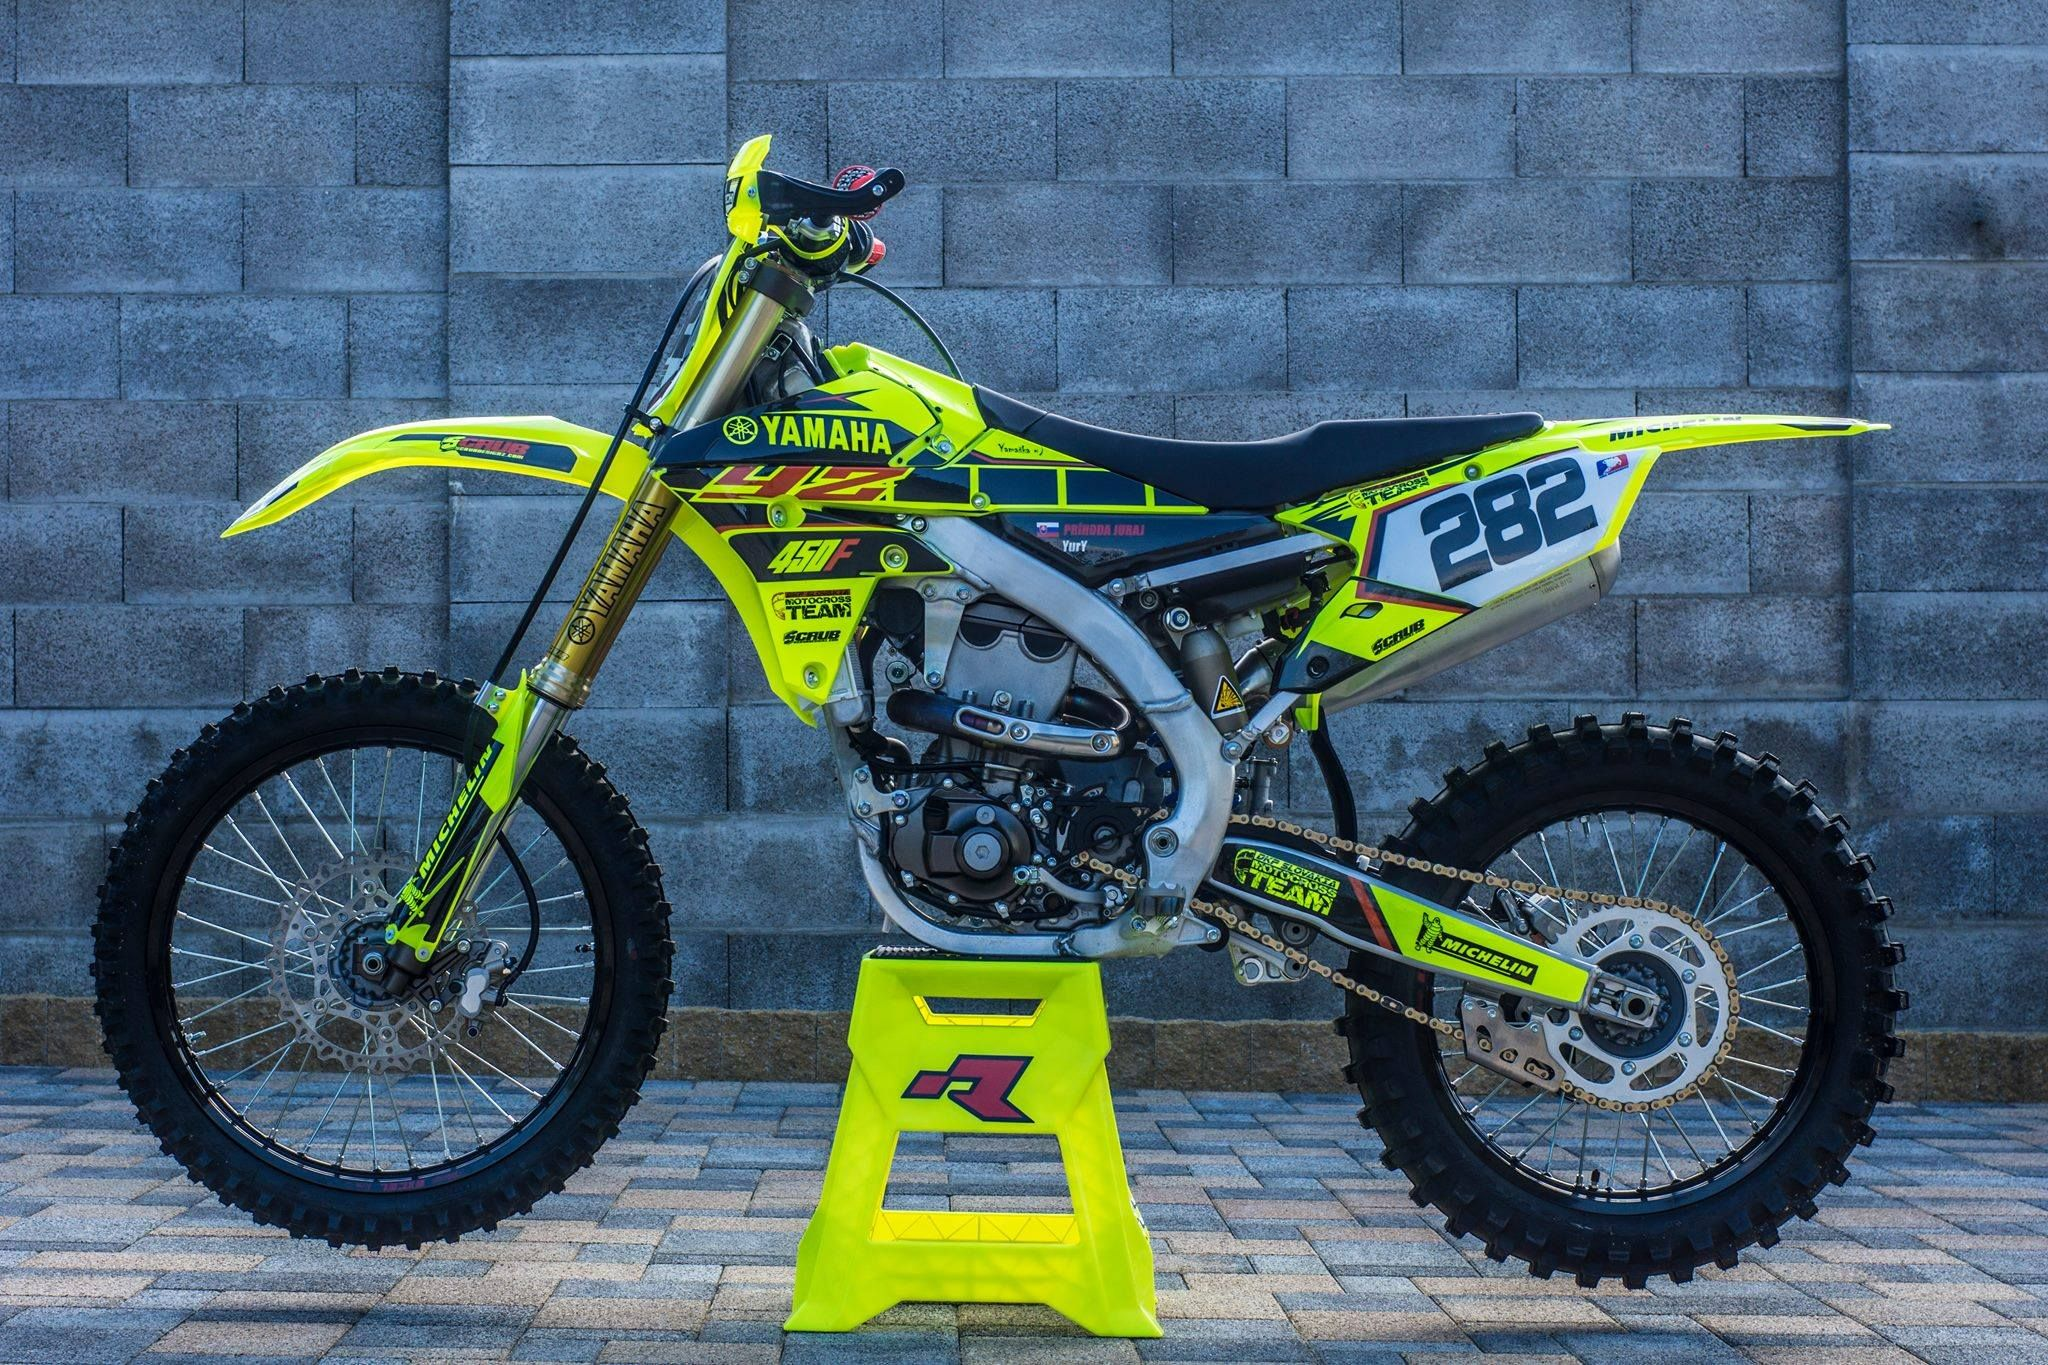 Get Ya Fluorescent Fluro Bike Dirtbike Mx Yamaha Motorcross Bike Ktm Dirt Bikes Motocross Bikes